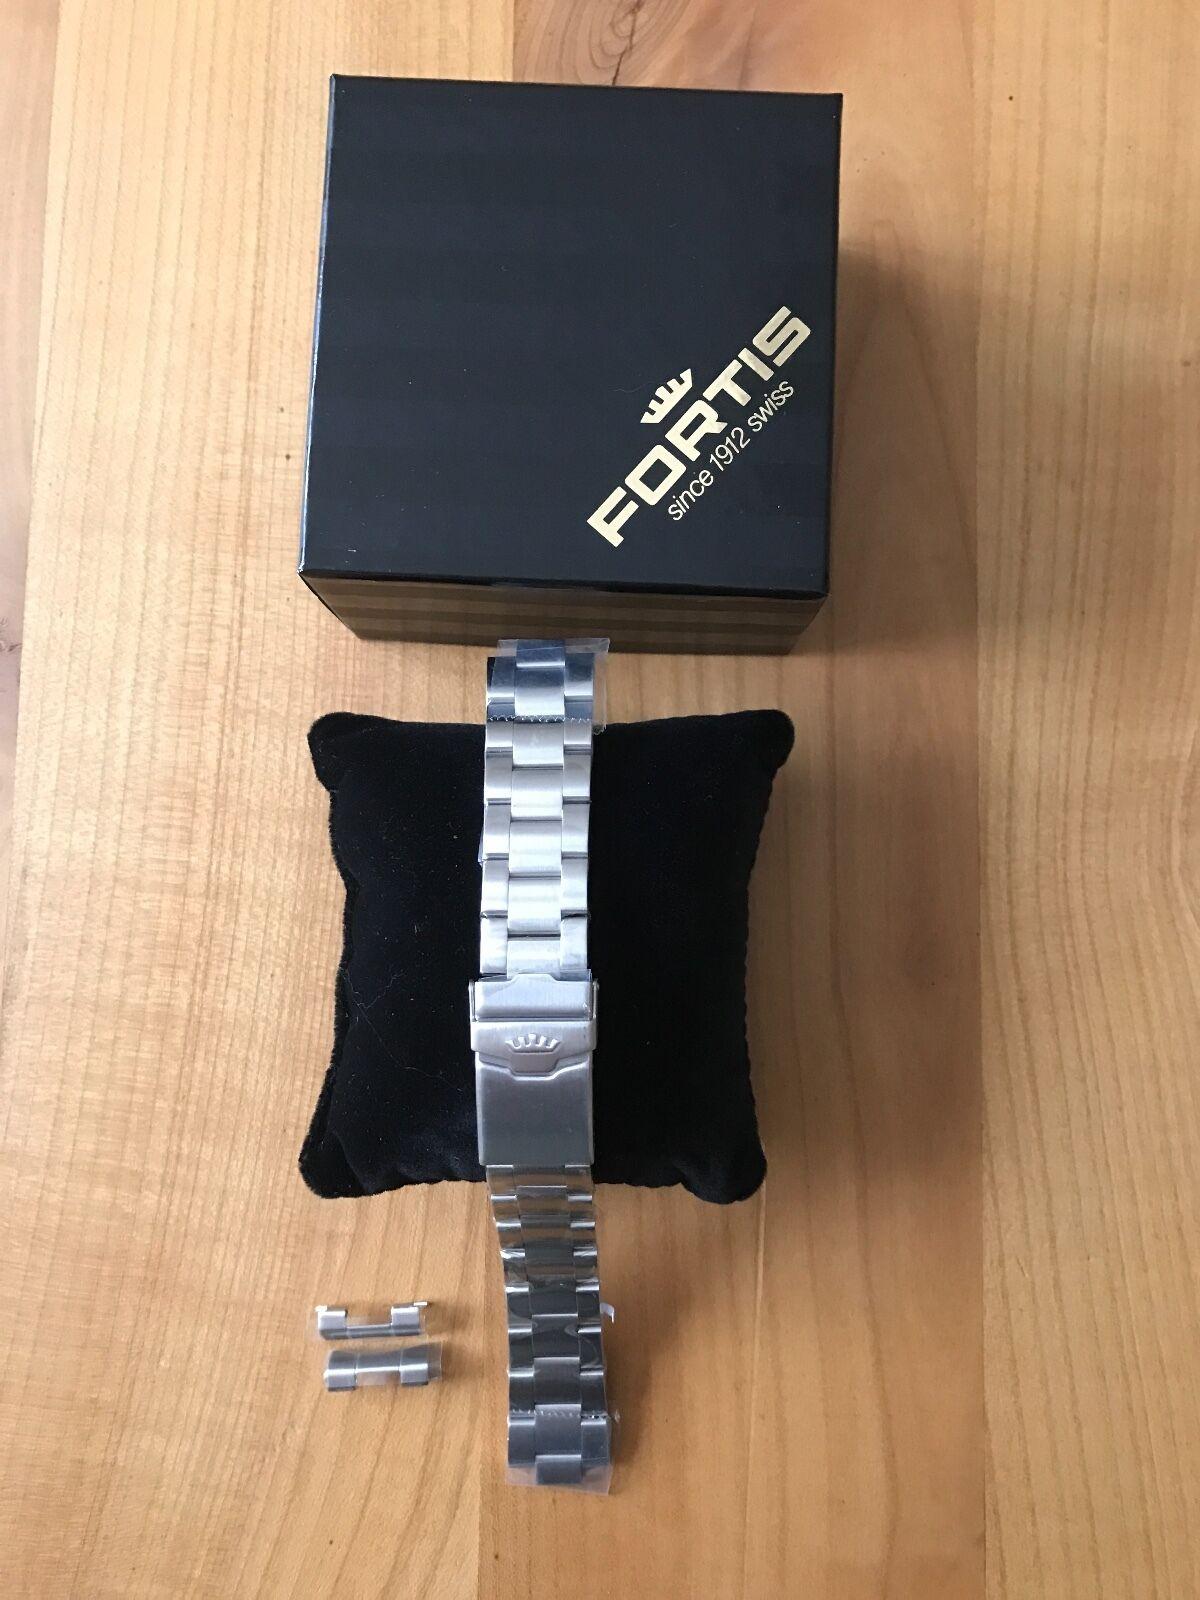 FORTIS Stahl Metall Armband Flieger z.B 595.xx, 597.xx, Gebürstet, Original, Neu